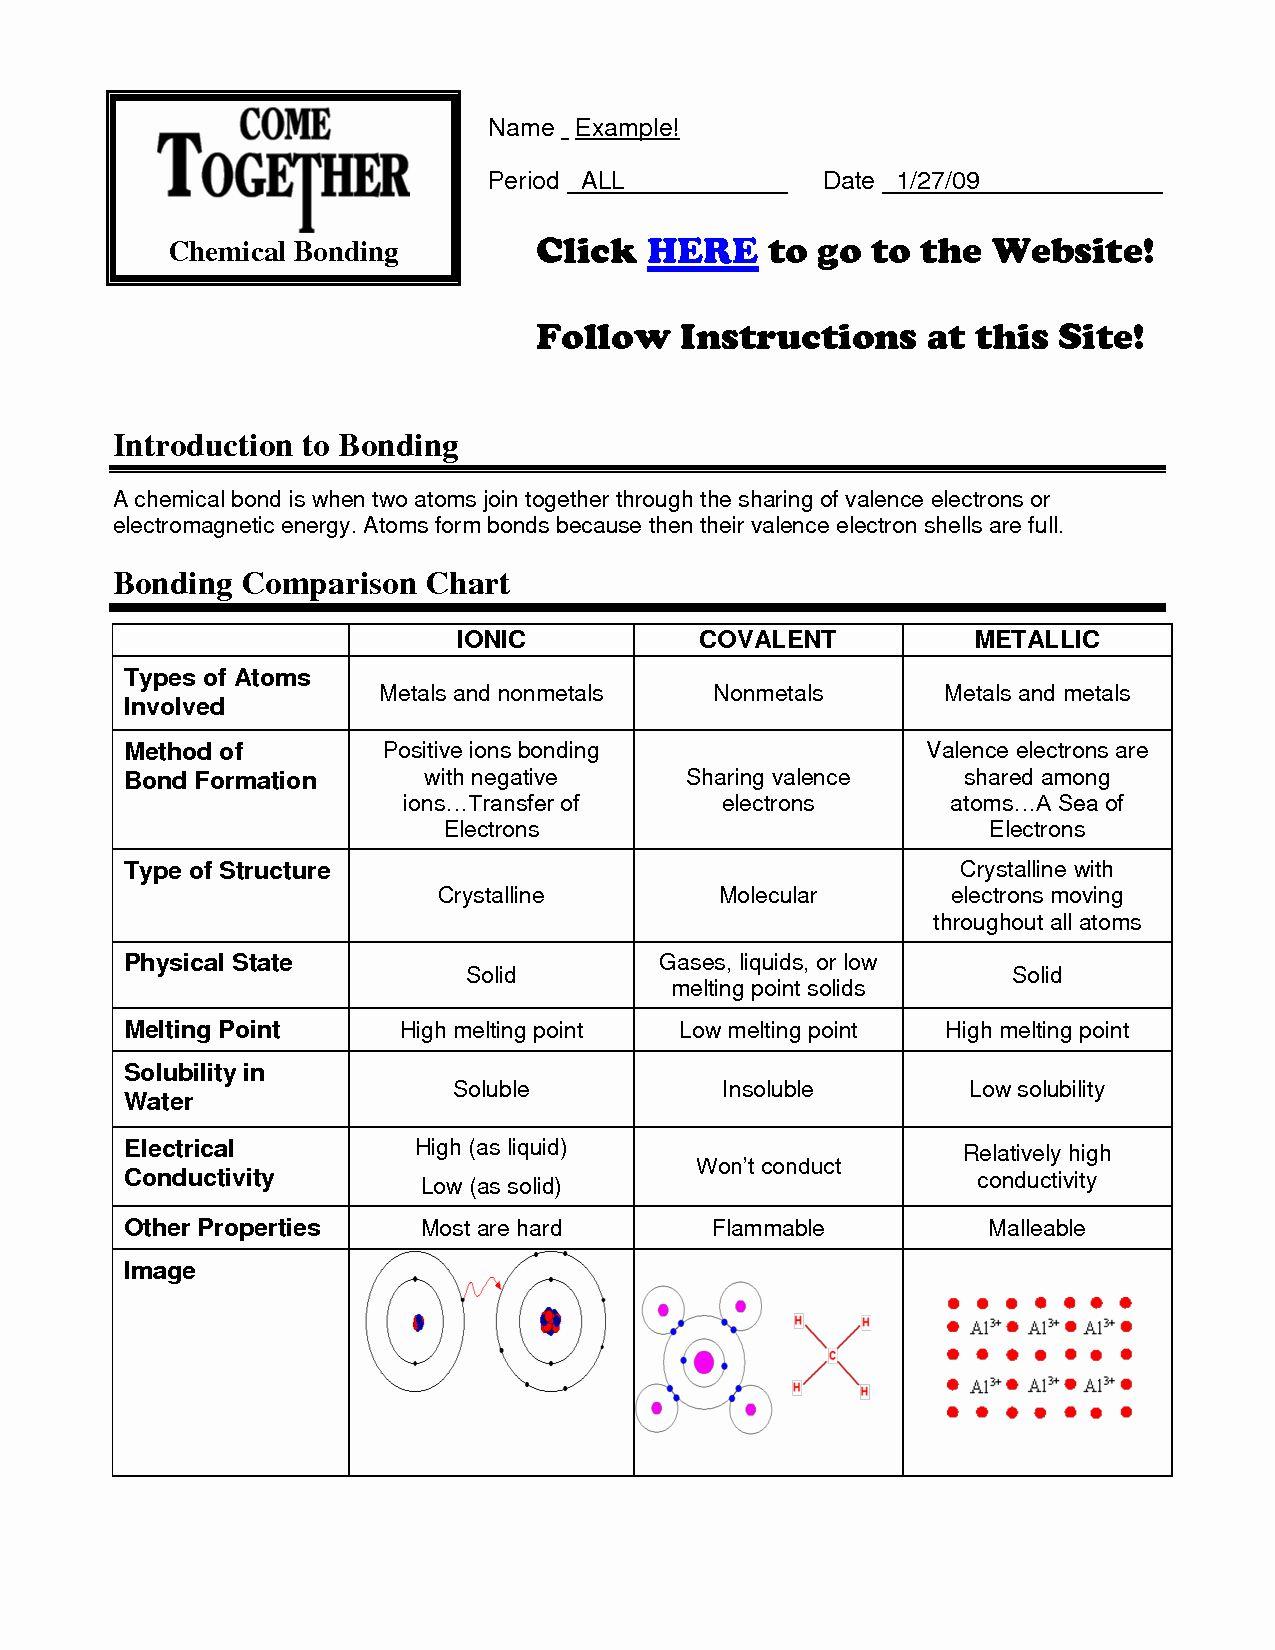 Chemical Bonding Worksheet Key Luxury Chemical Bonding Worksheet Chessmuseum Template Libra In 2020 Chemical Bond Covalent Bonding Worksheet Writing Linear Equations